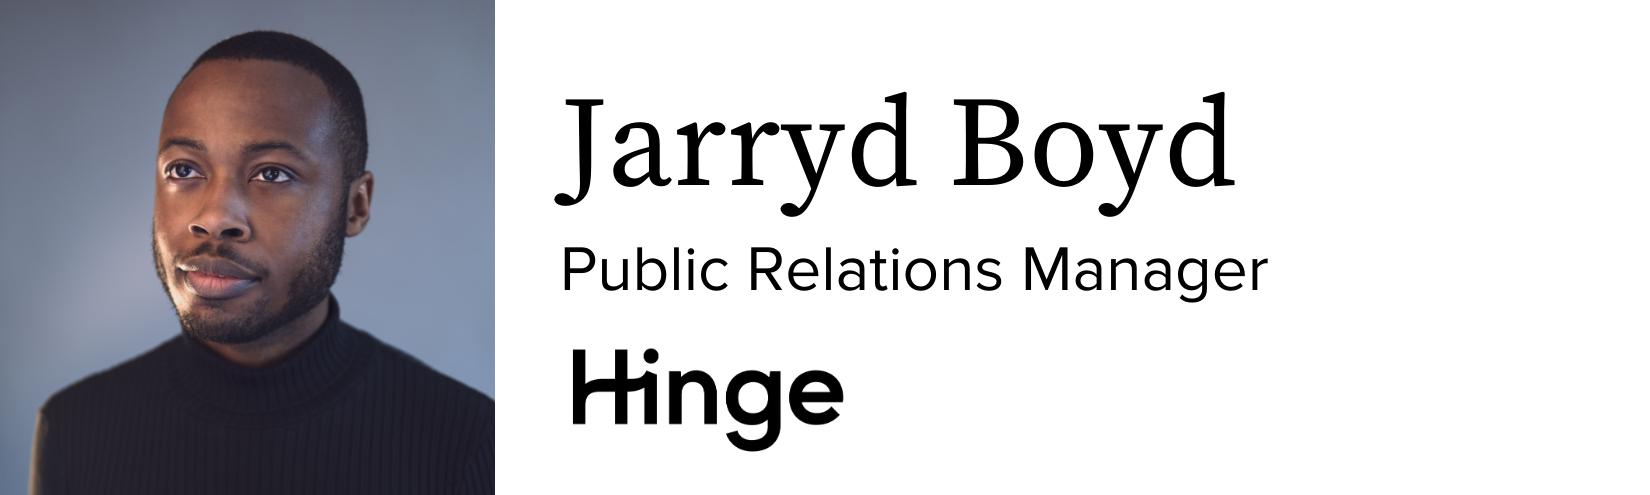 jarryd-boyd-webinar-speaker